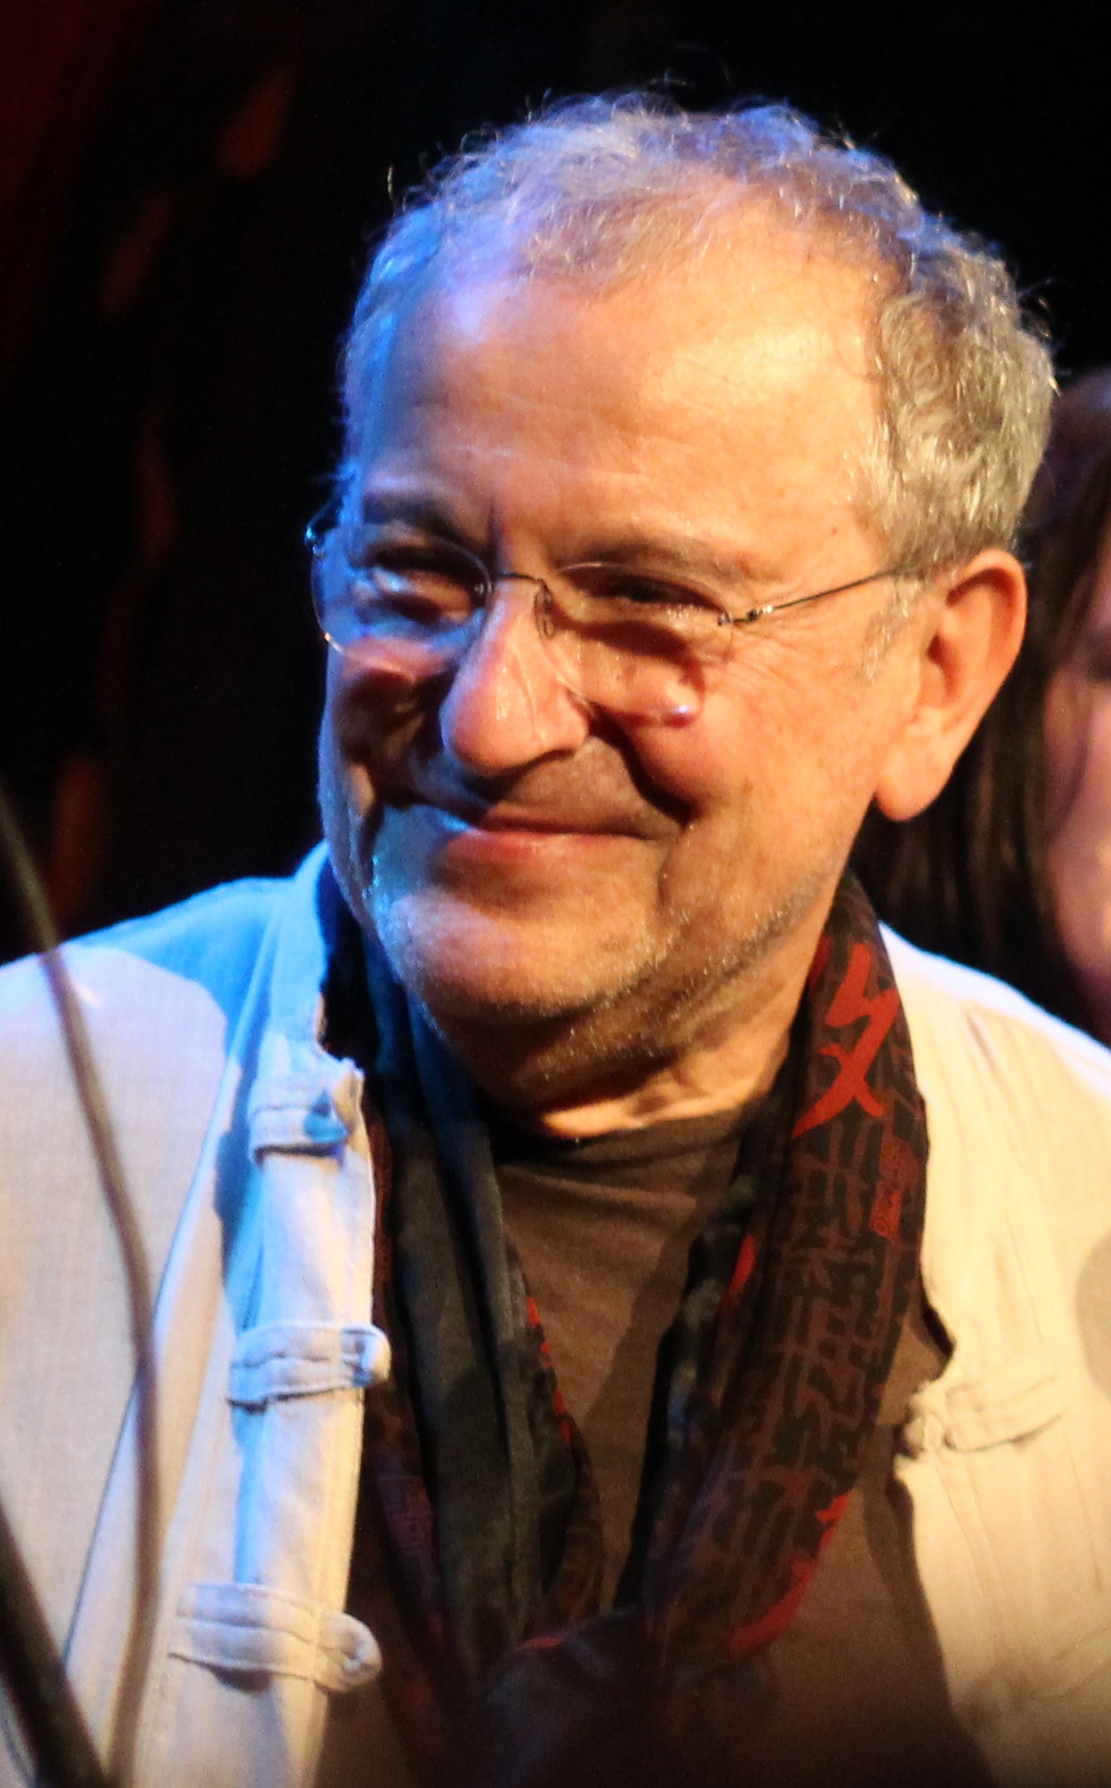 Image of Ryszard Horowitz from Wikidata